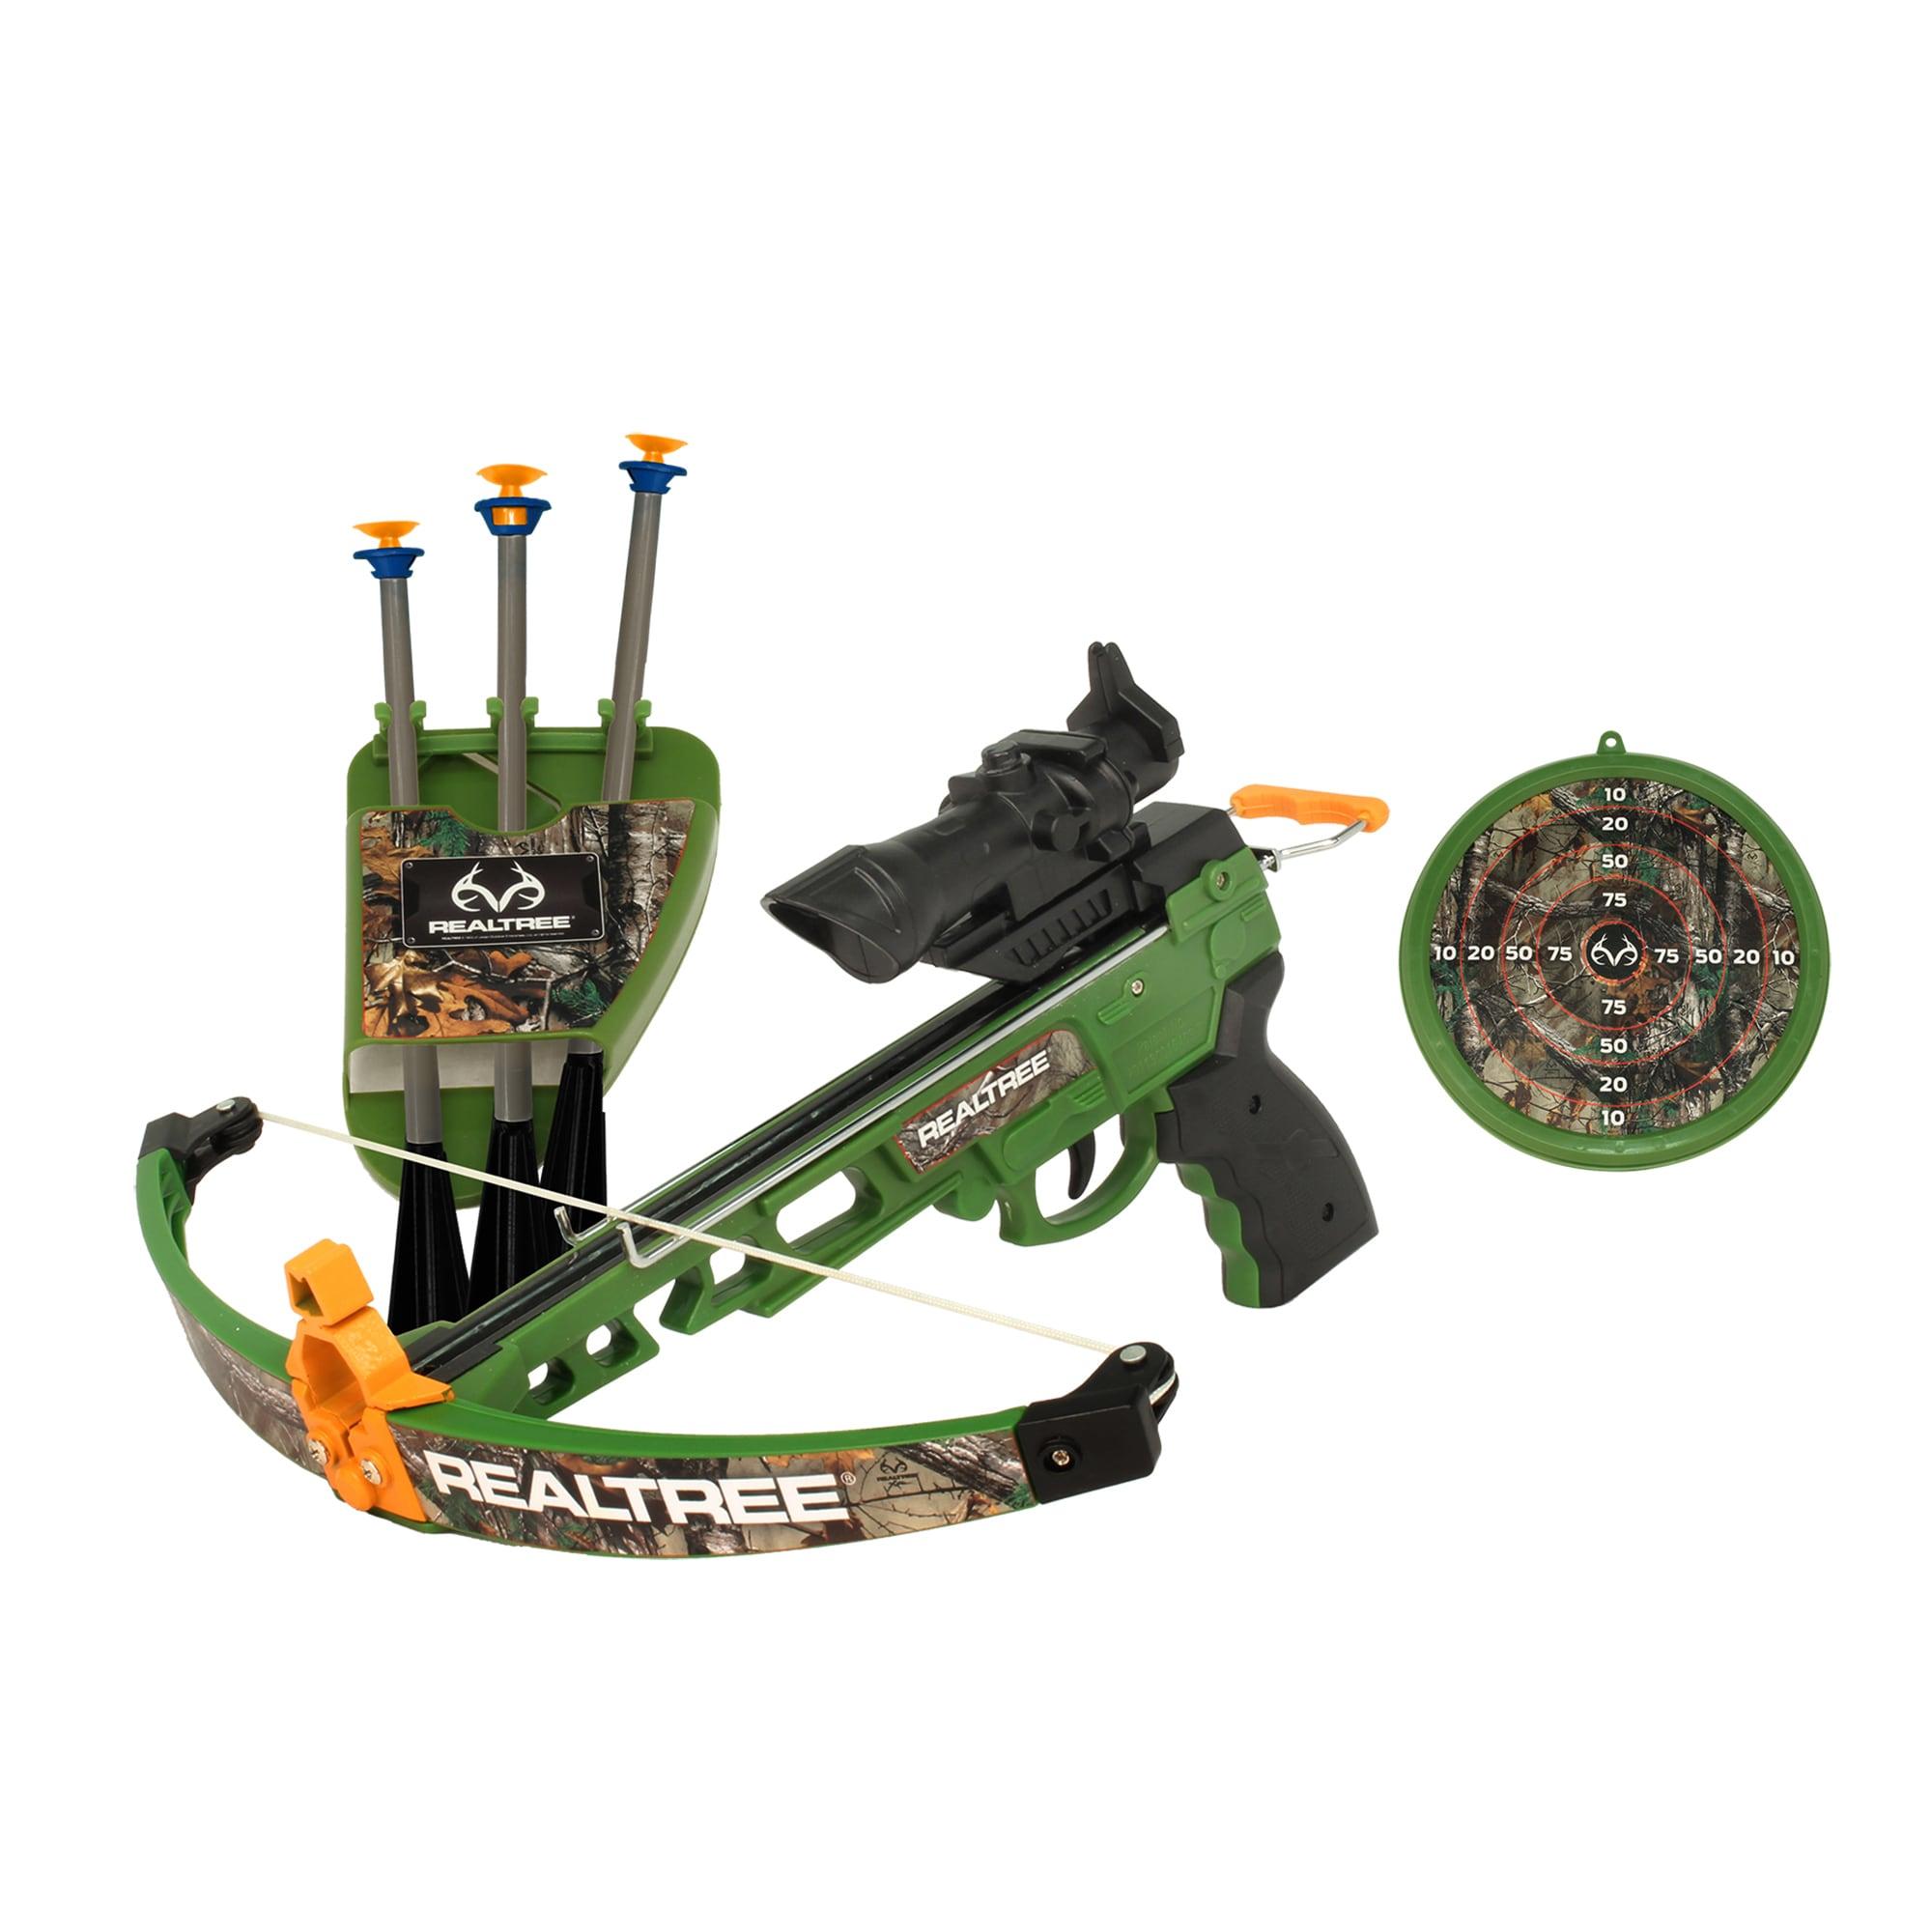 Realtree Toy Pistol Crossbow (0698143250125)